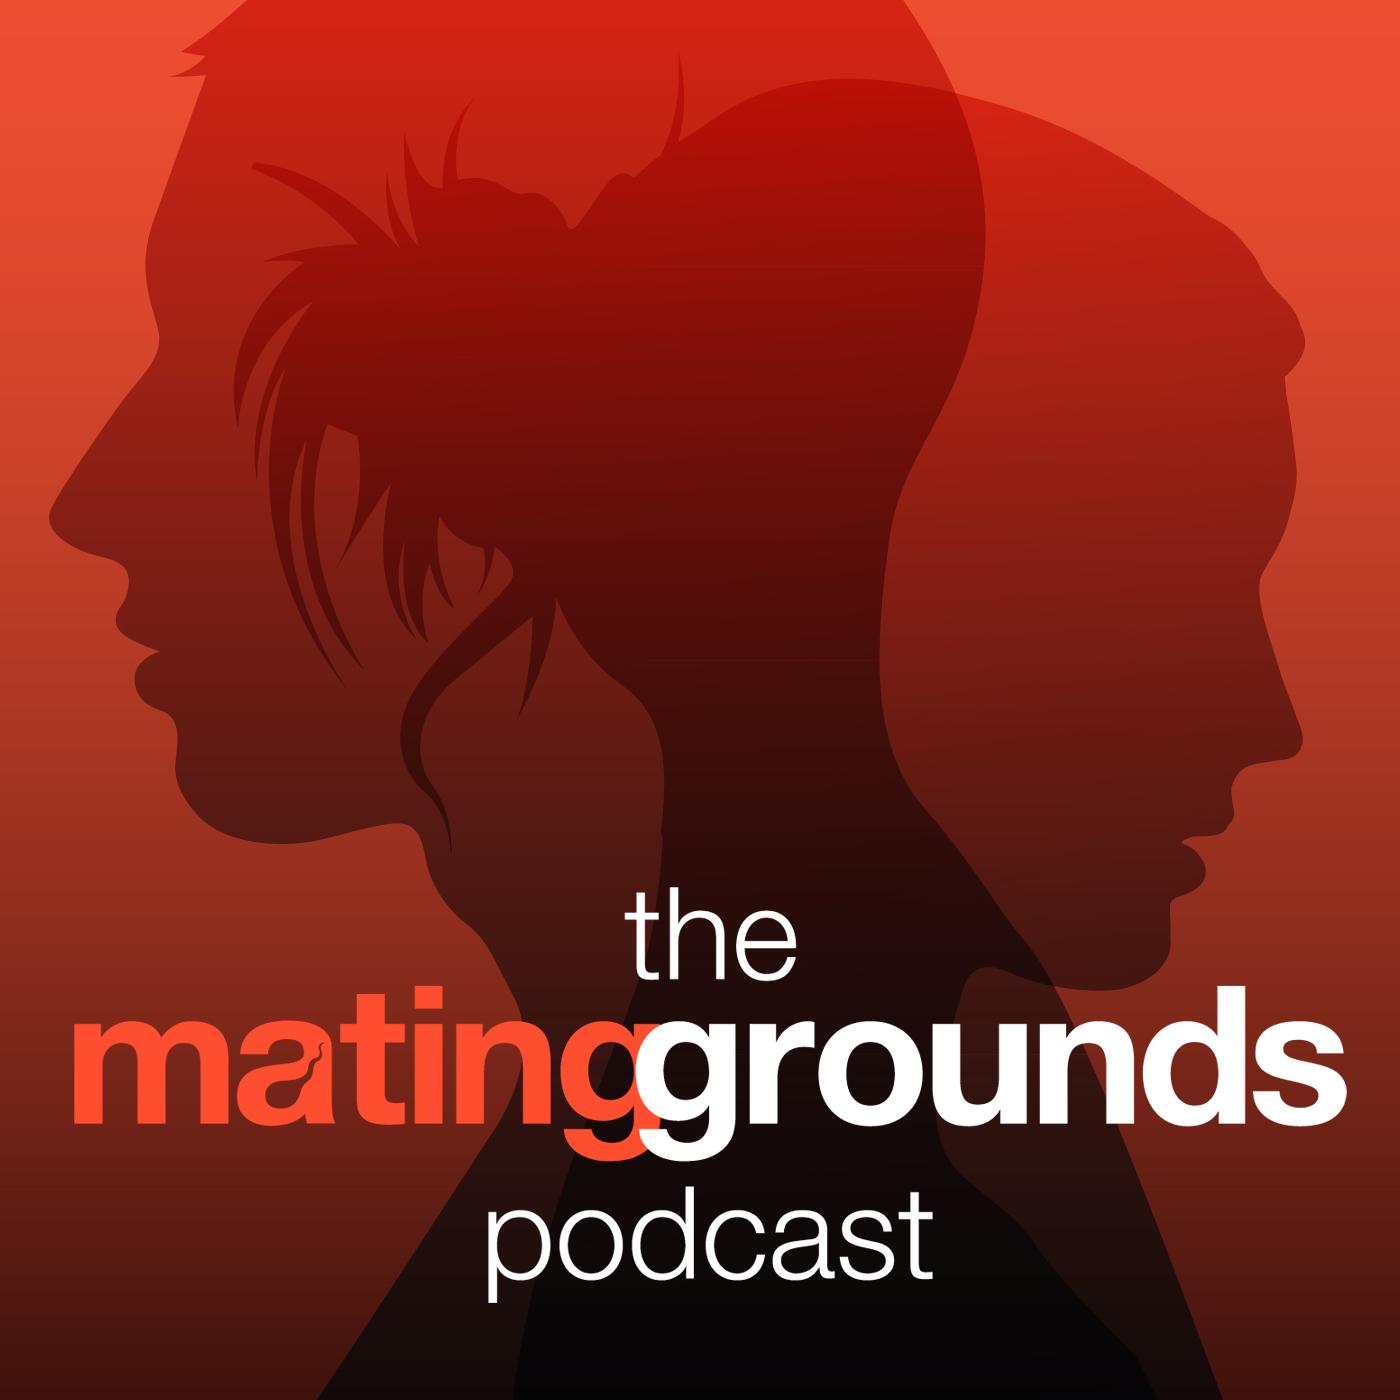 MatingGroundsPodcast.jpg